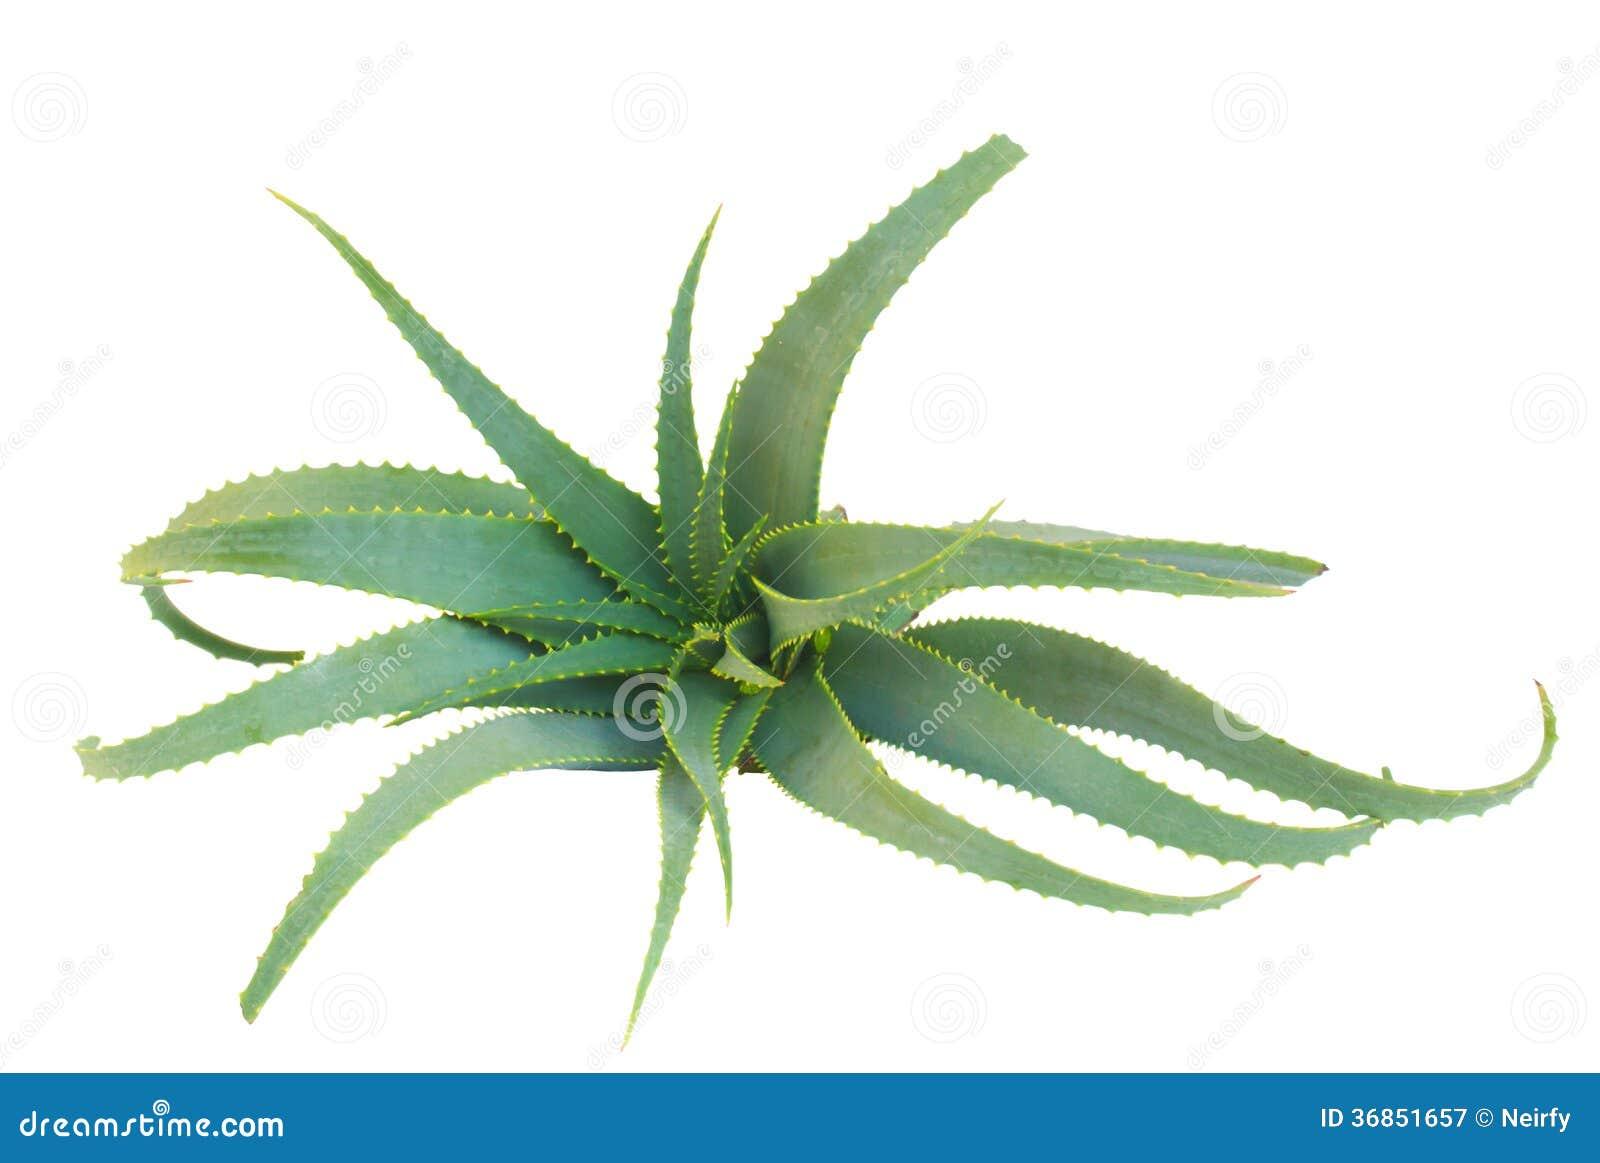 aloe vera plant royalty free stock photography image 36851657. Black Bedroom Furniture Sets. Home Design Ideas